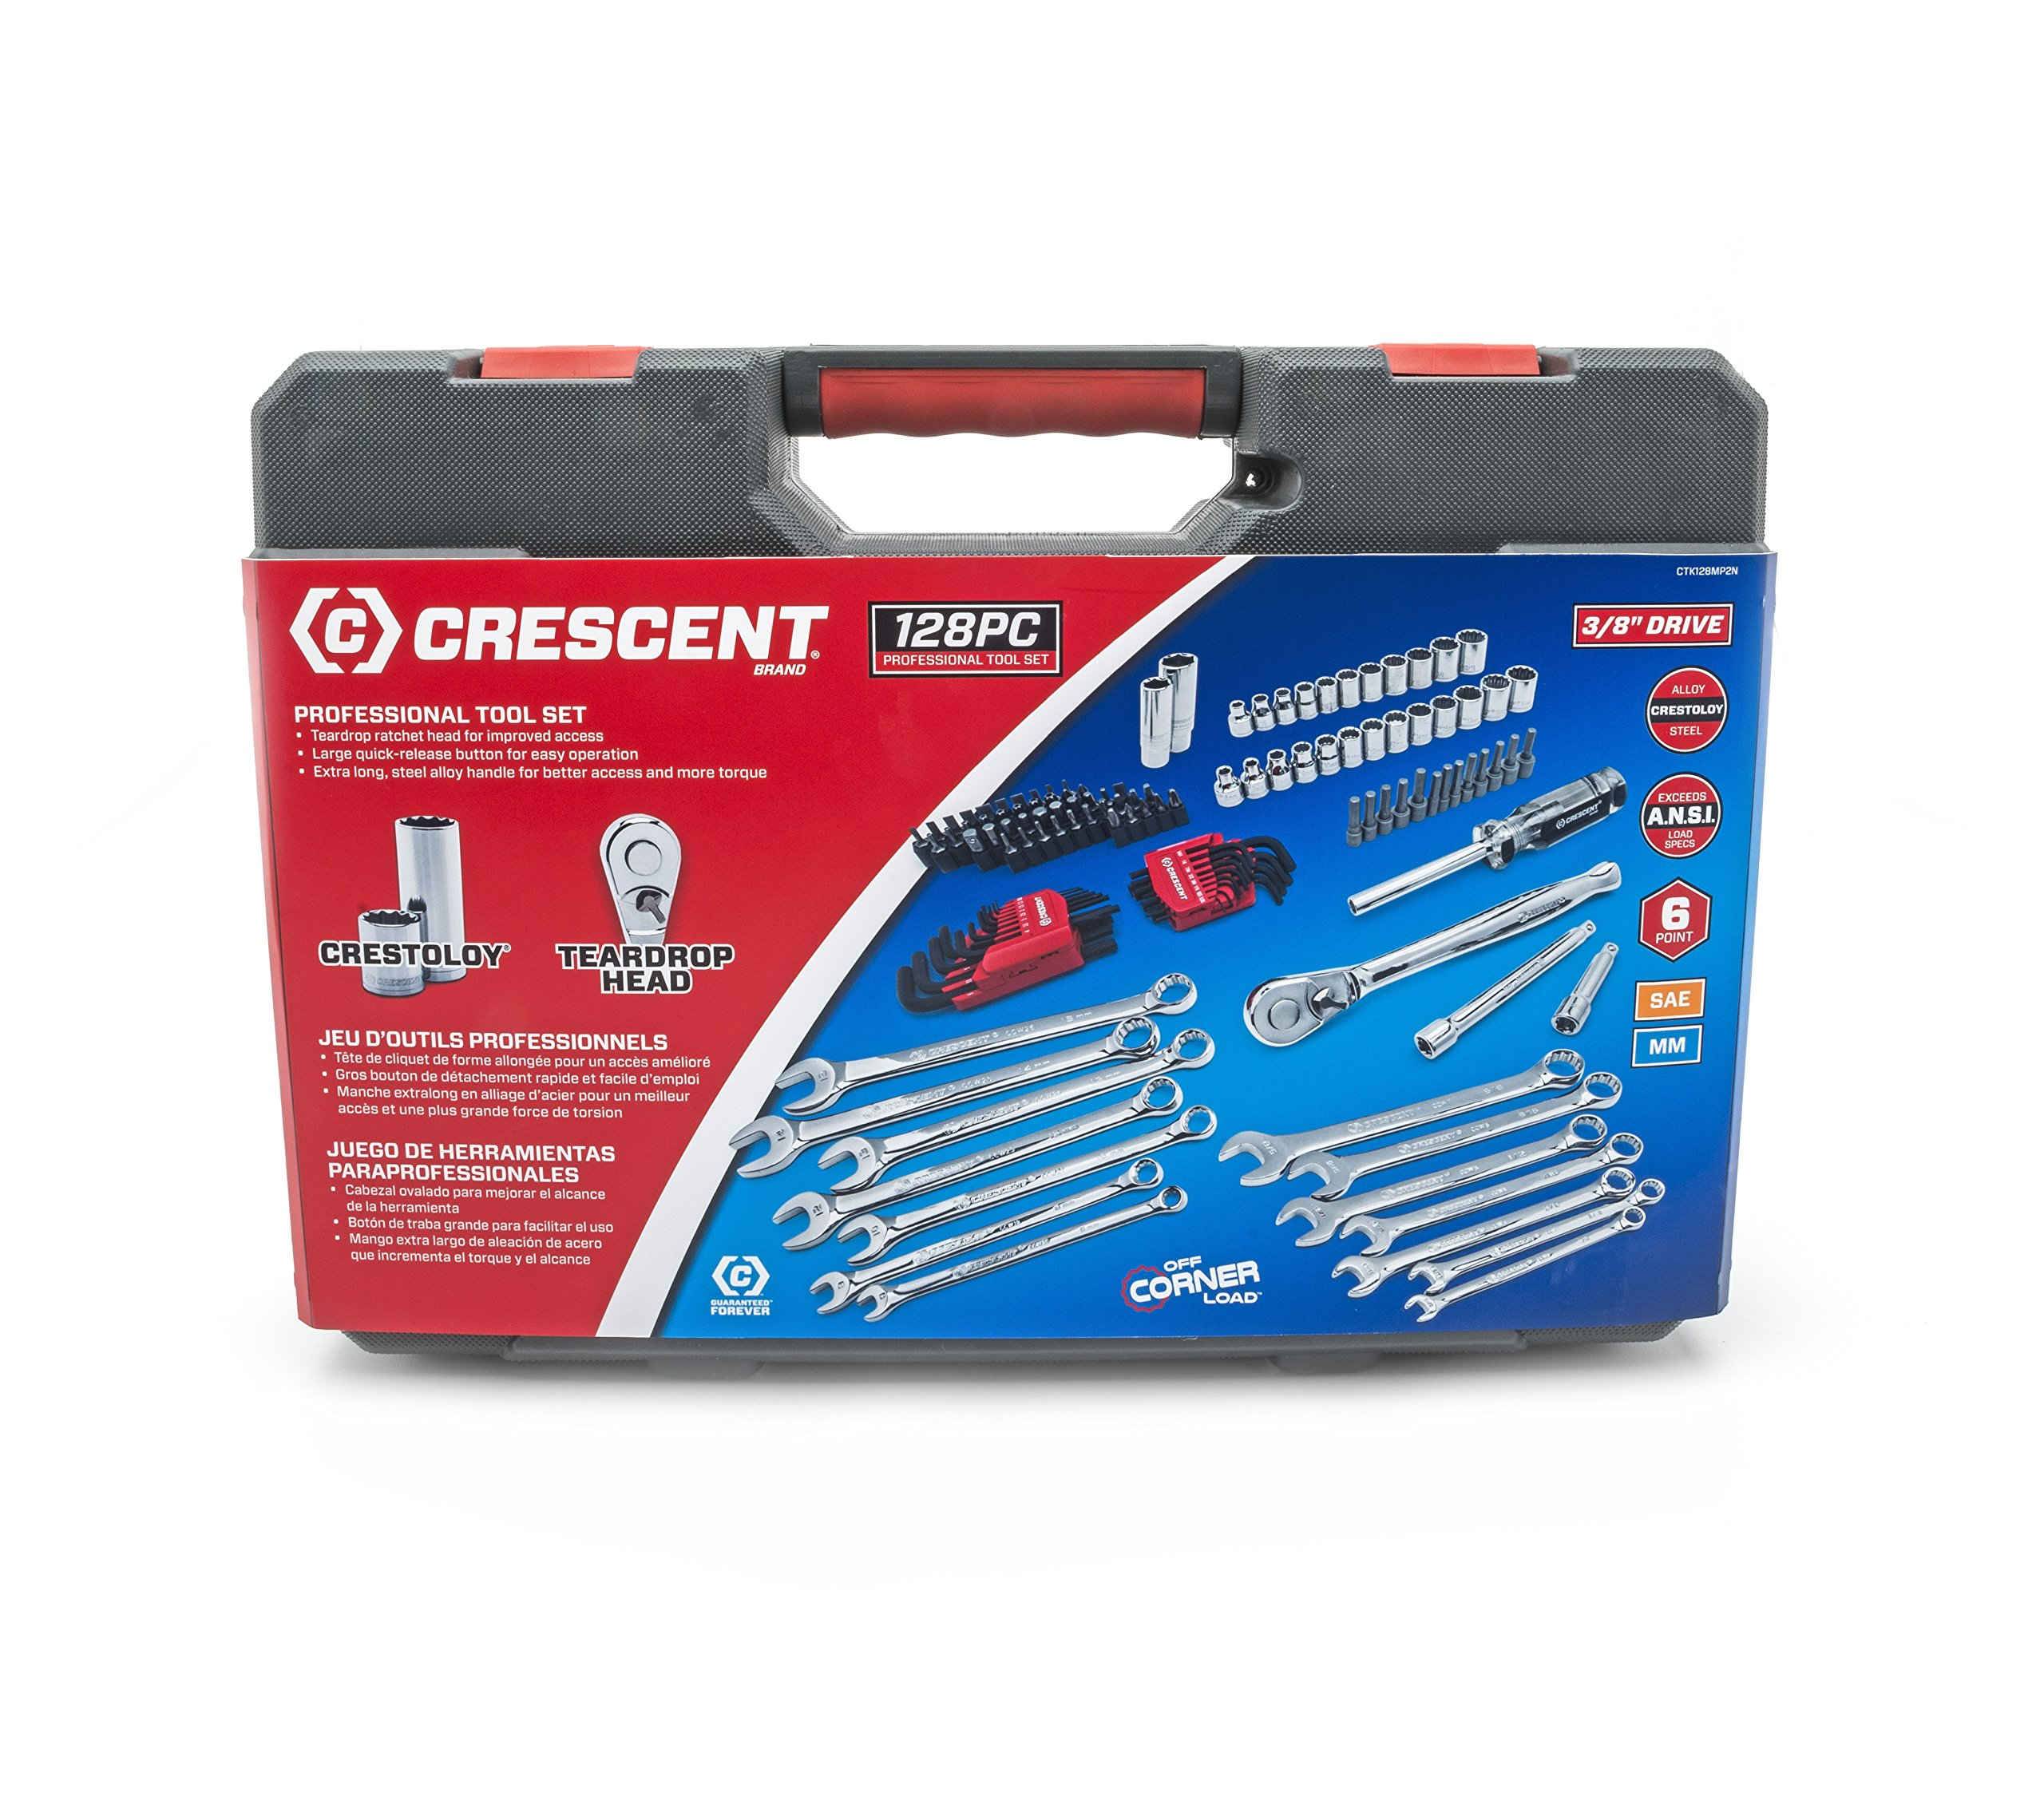 Crescent CTK128MP2N Mechanics Tool Set (128 Piece) by Crescent (Image #3)